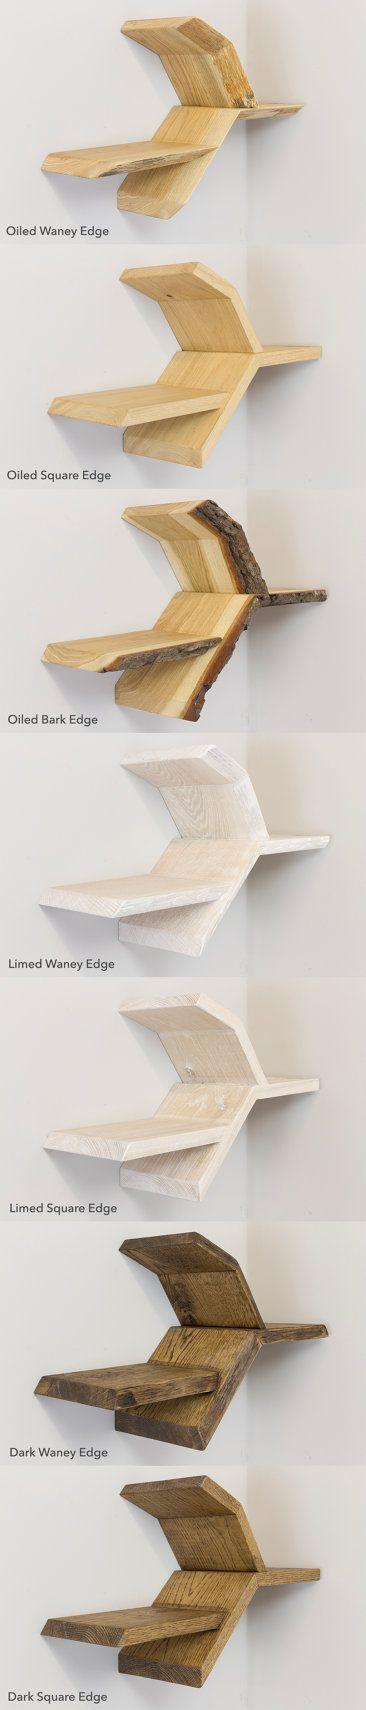 Elm Tree Bookshelf Our New Tree Shelf Design by BespOakInteriors